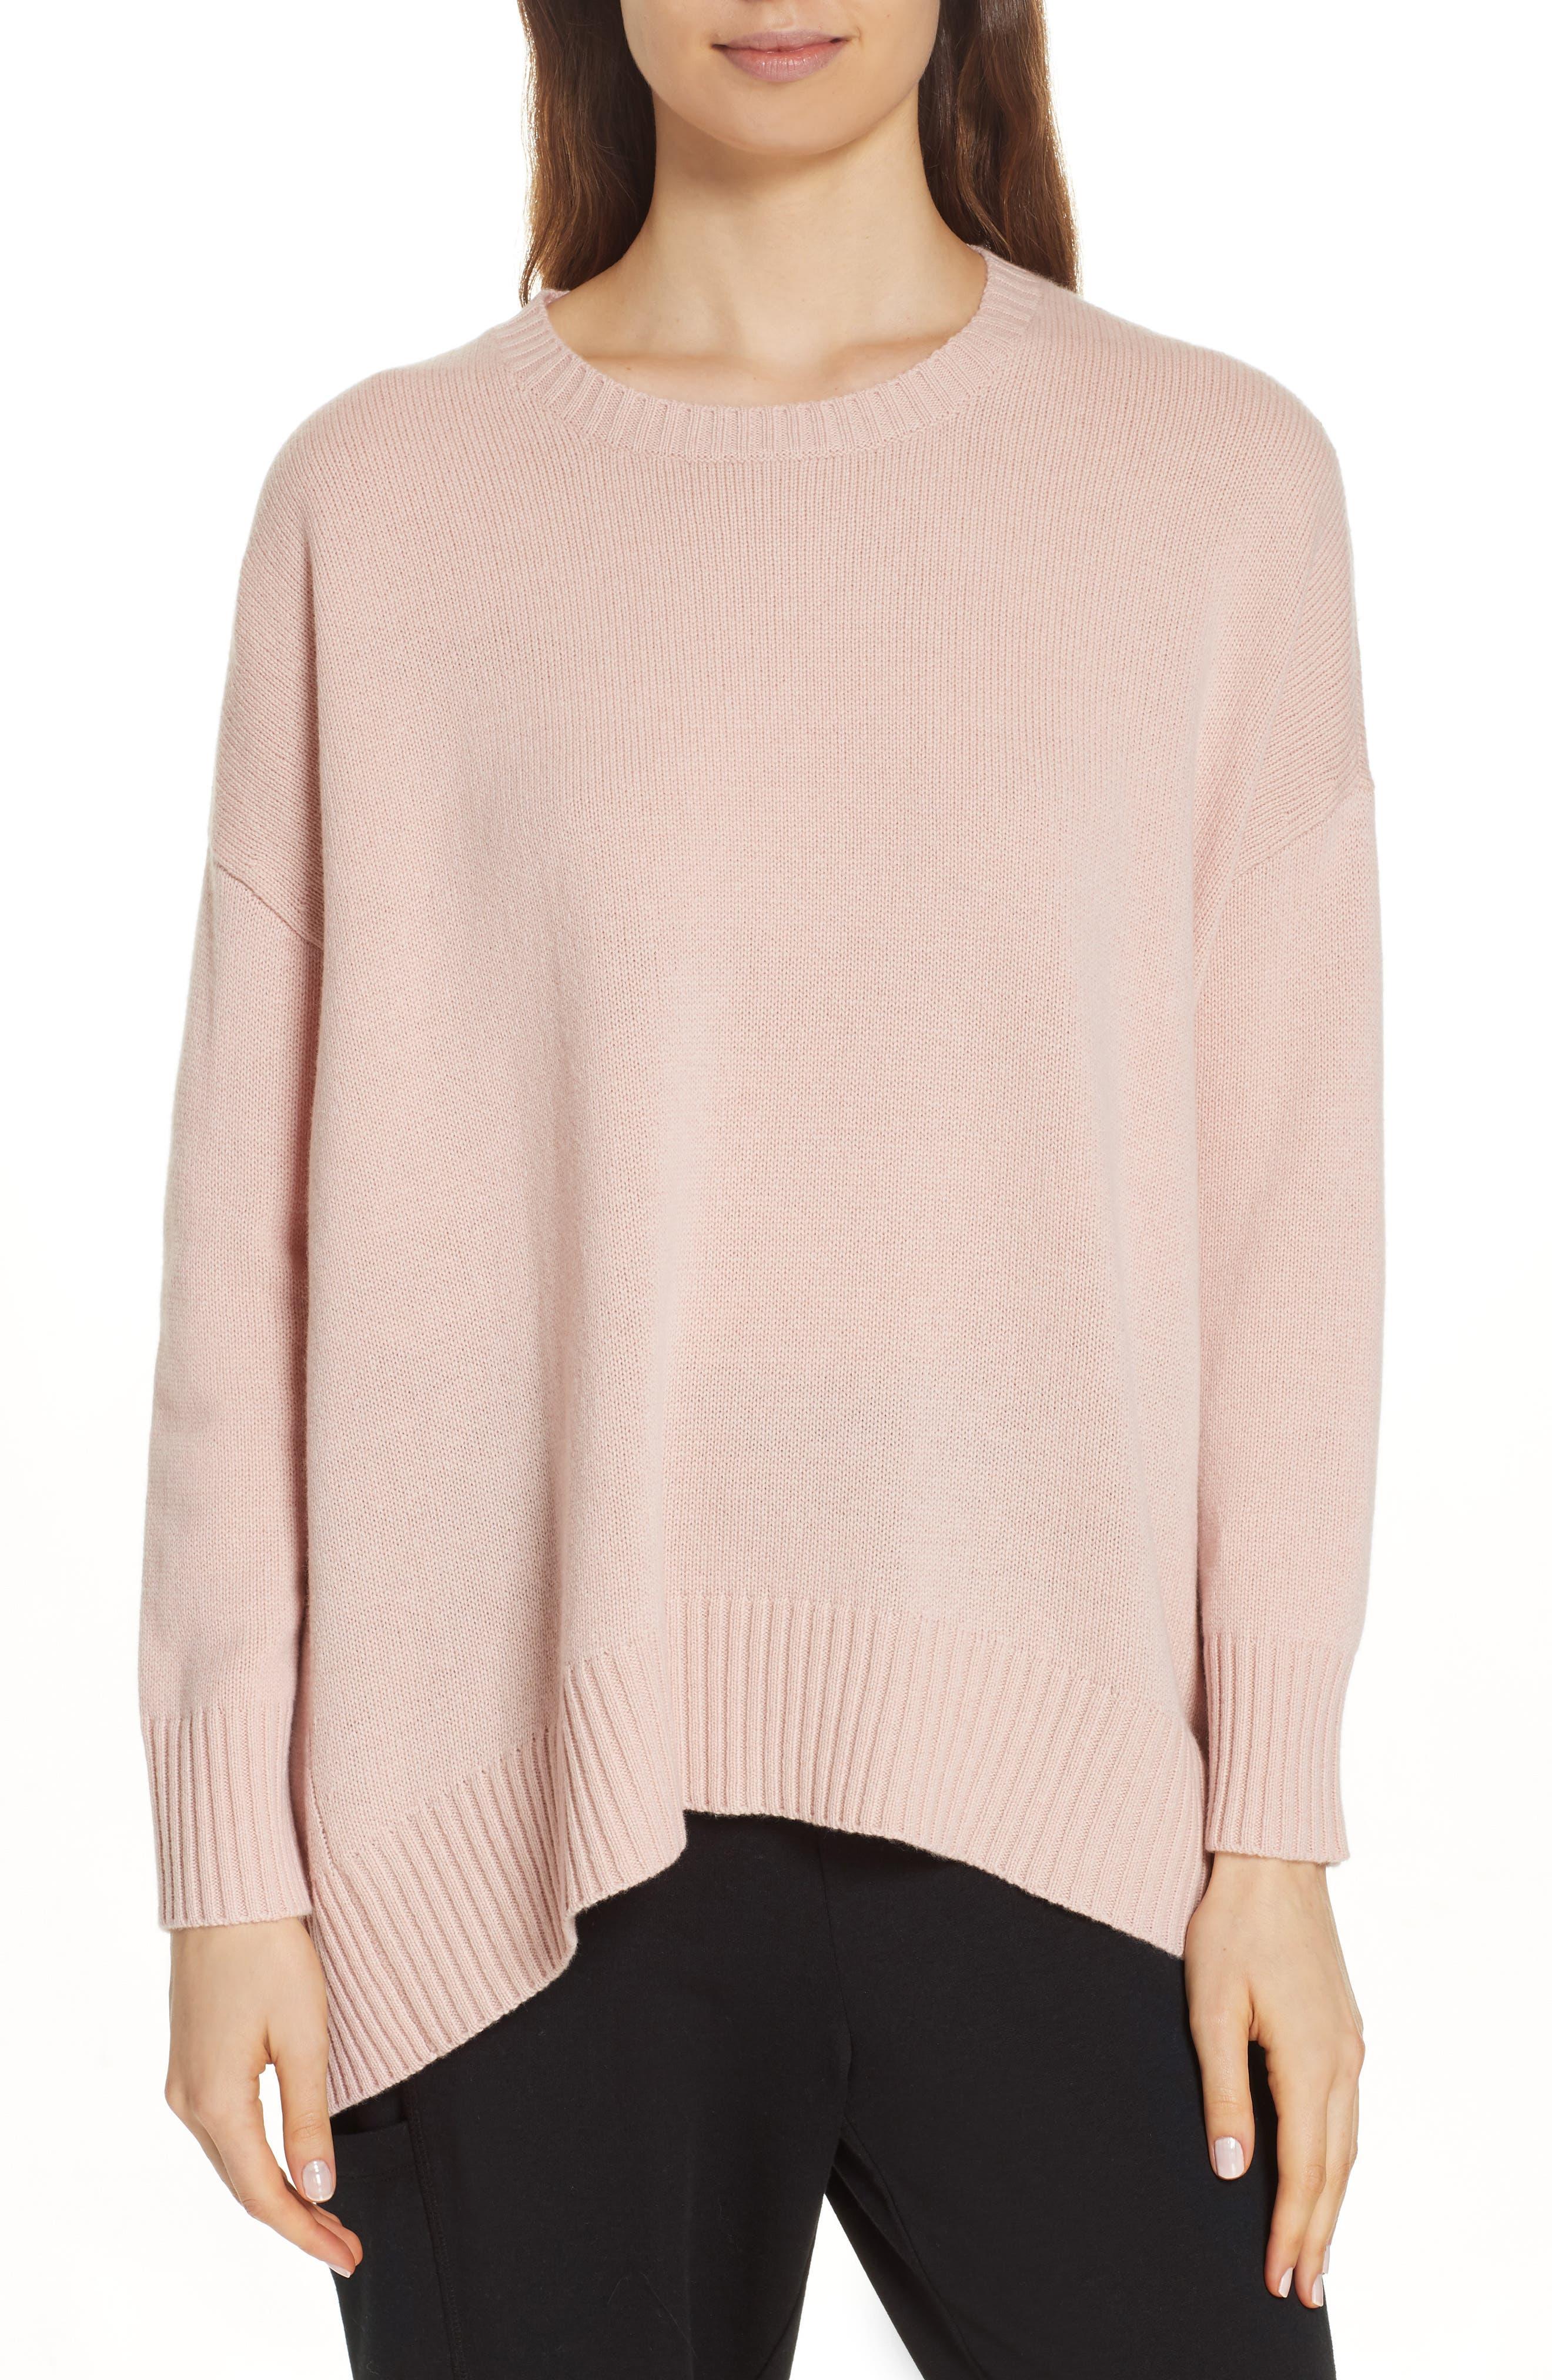 Eileen Fisher Cashmere & Wool Blend Oversize Sweater